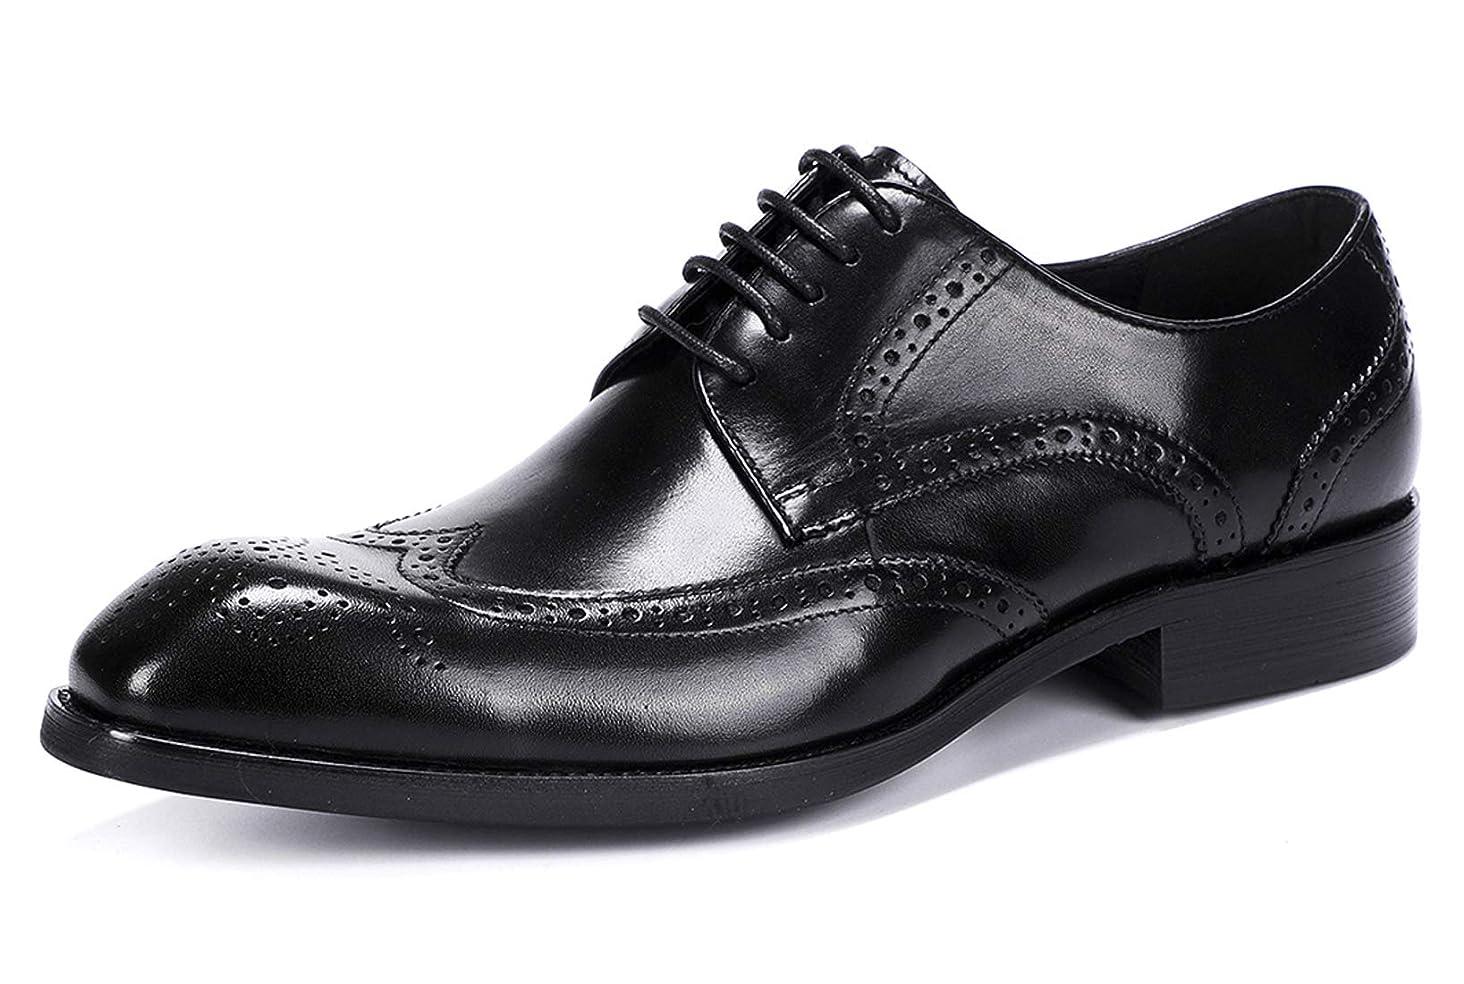 Wingtip Lace-Up Oxford Shoes for Men - Mens Leather Dress Shoes,Brogue Formal Shoes,Derbies Shoes